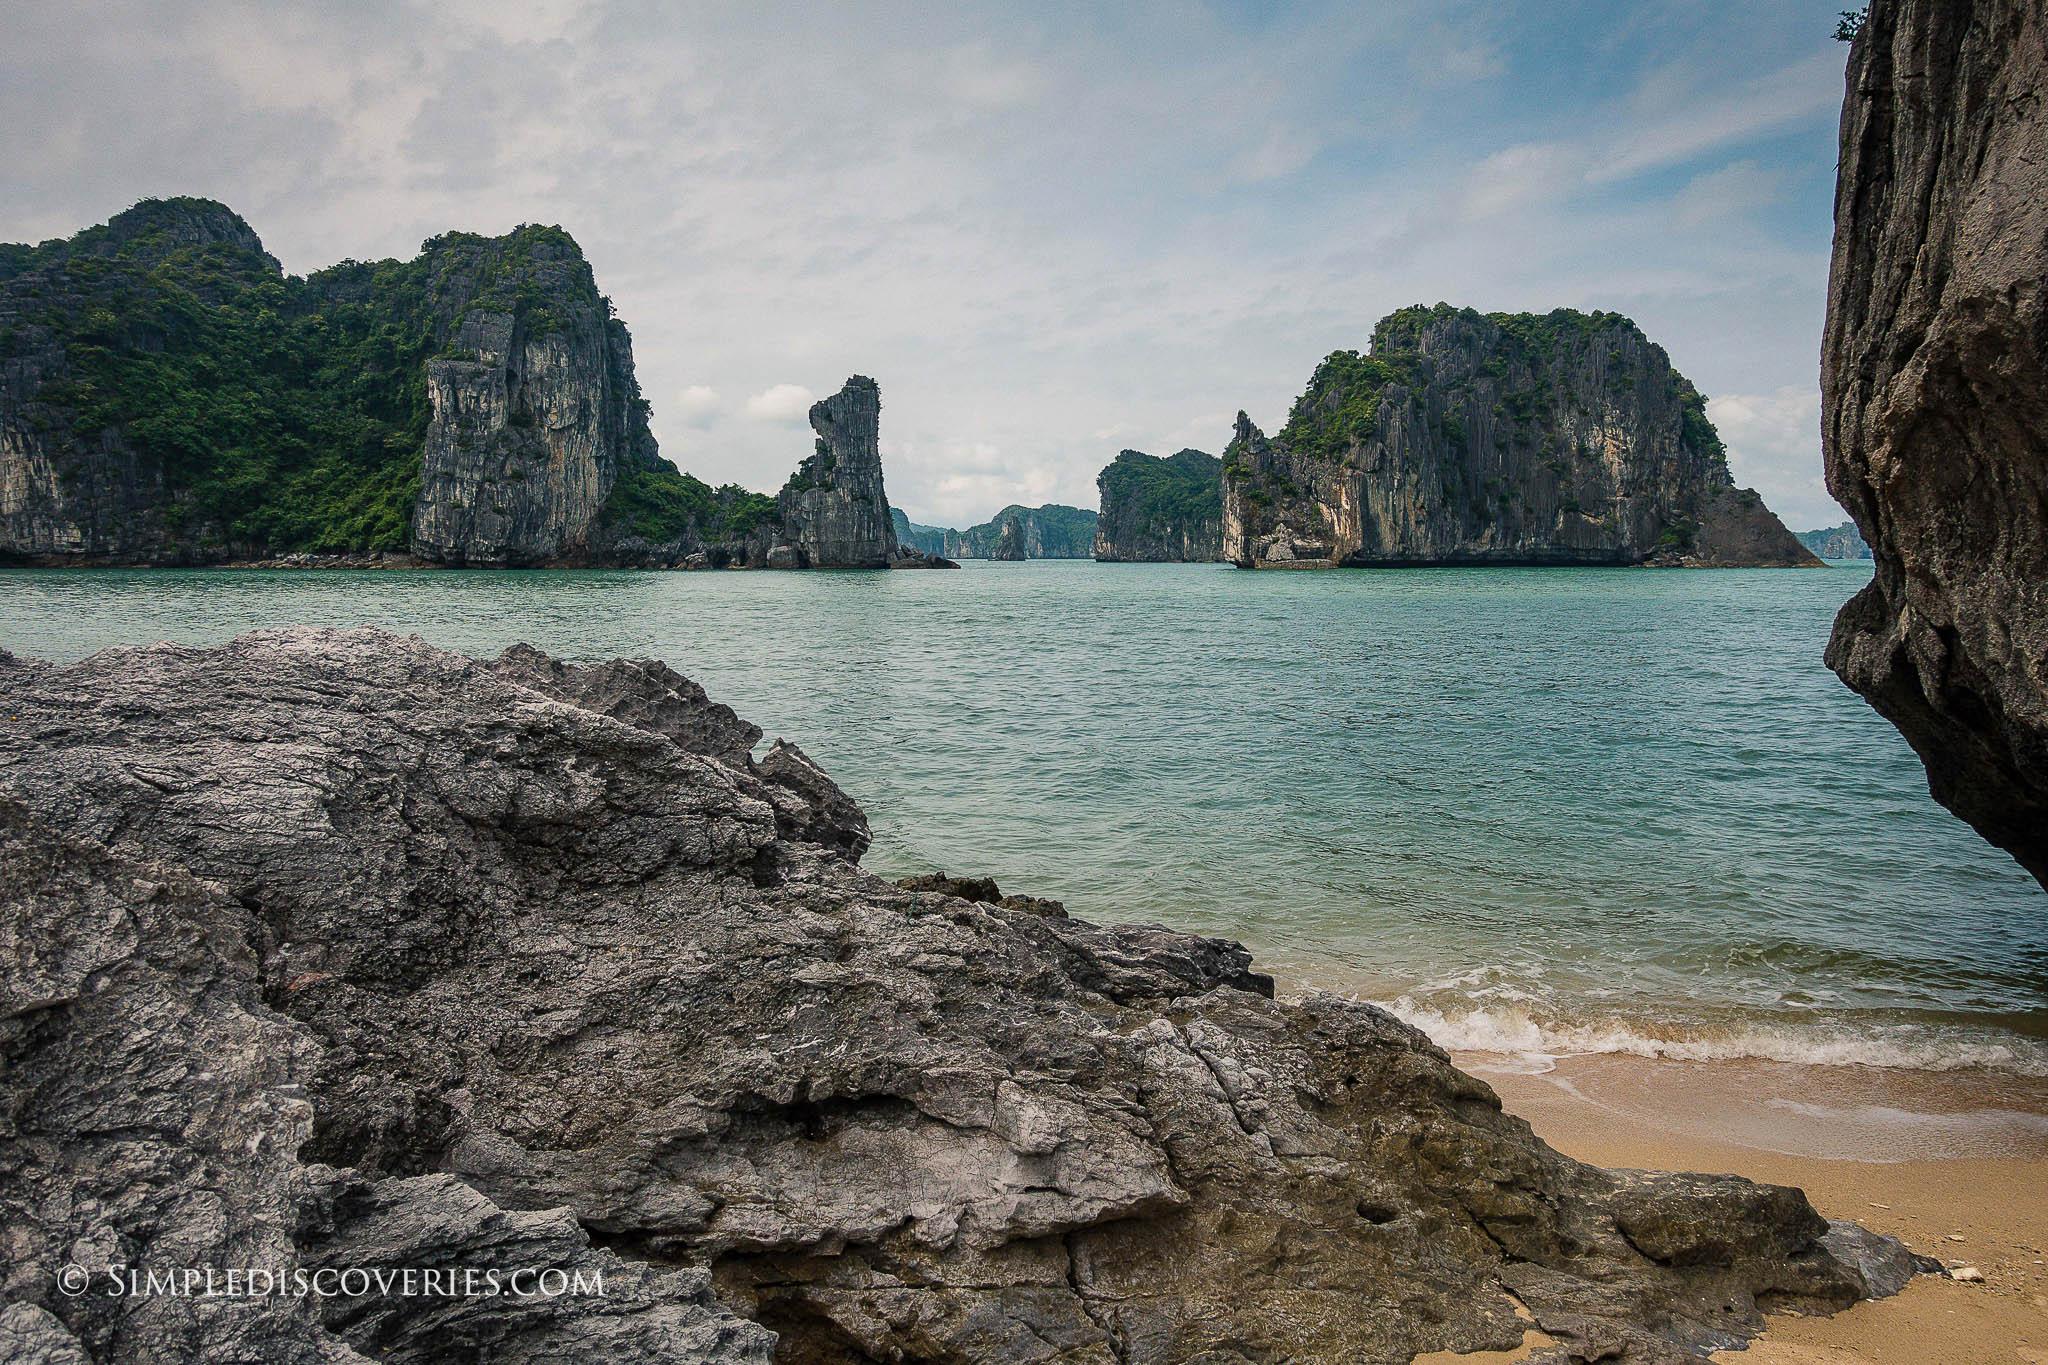 bai_tu_long_bay_vietnam